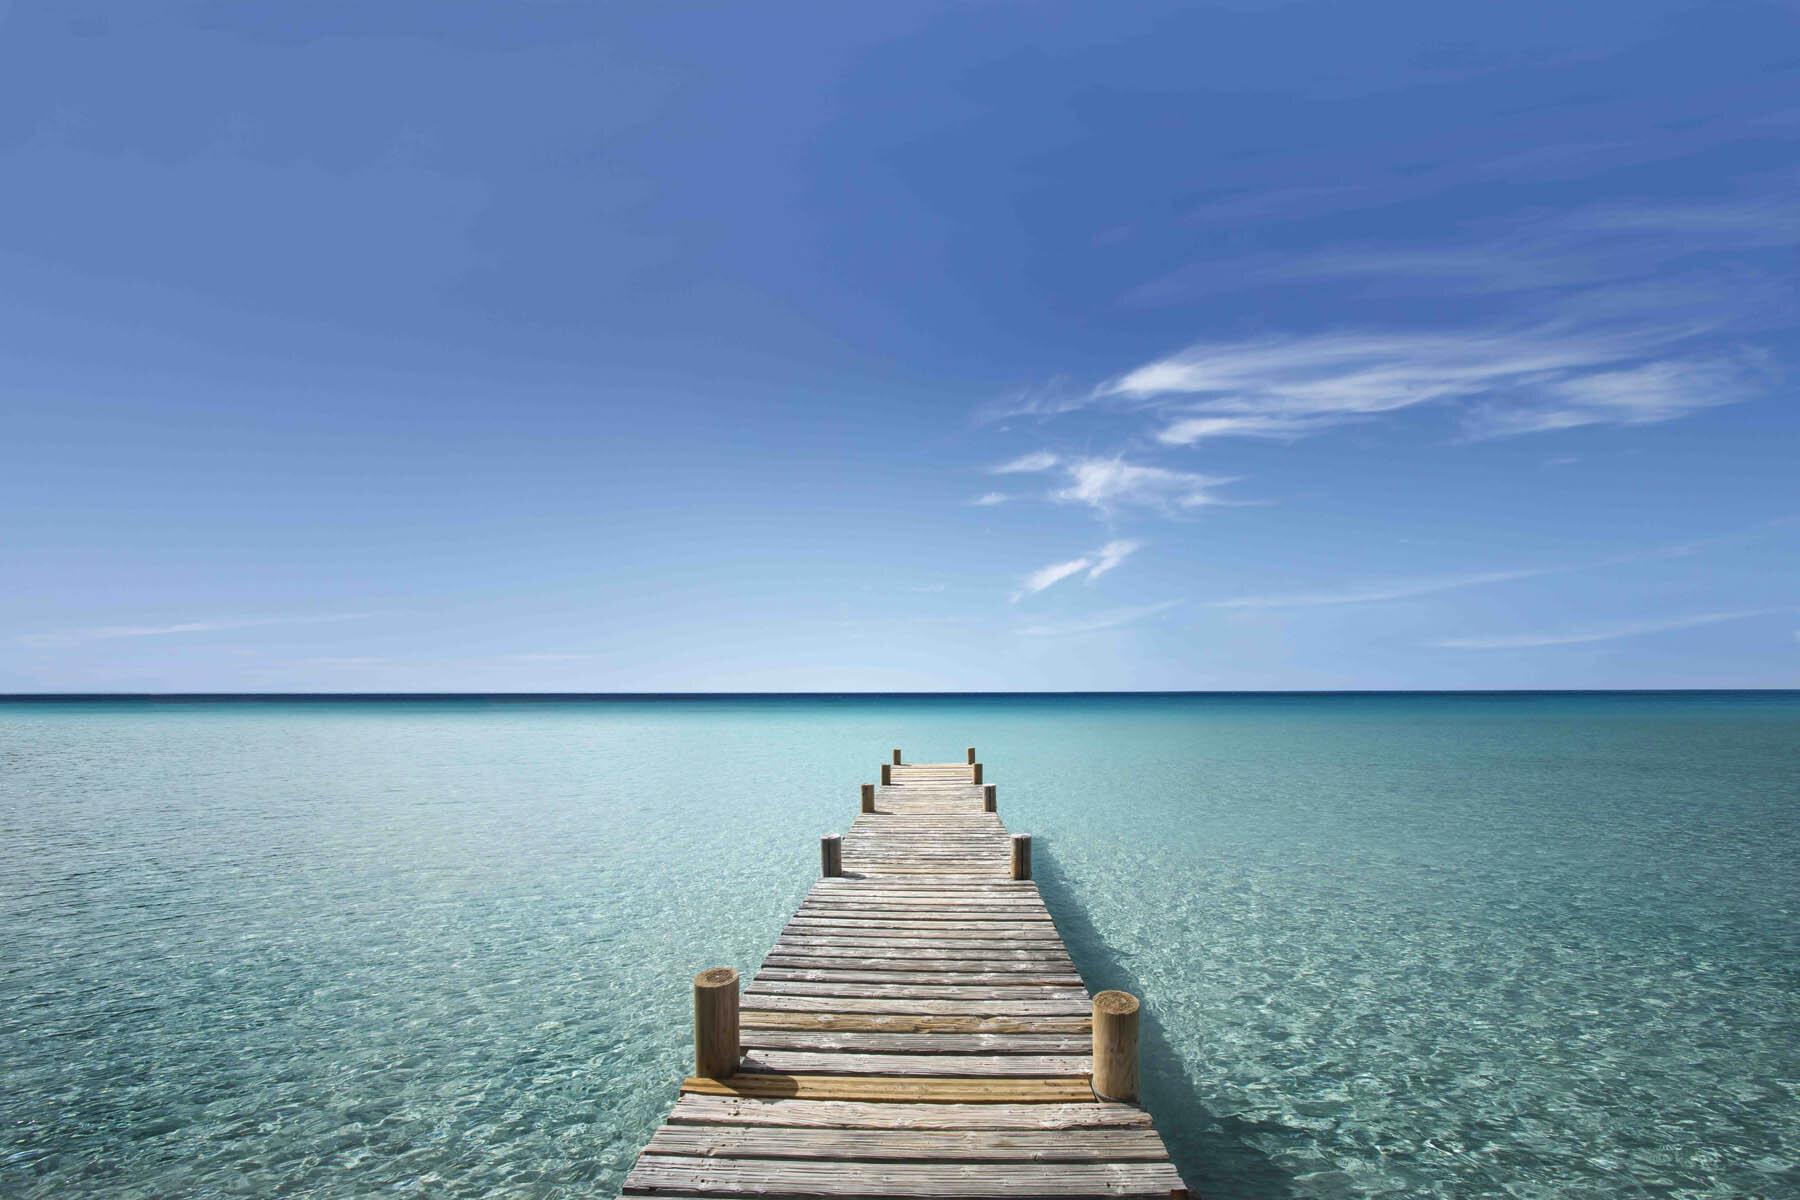 PlateART Duschrückwand mit Motiv Strand und Meer Steg Malediven K_05_16